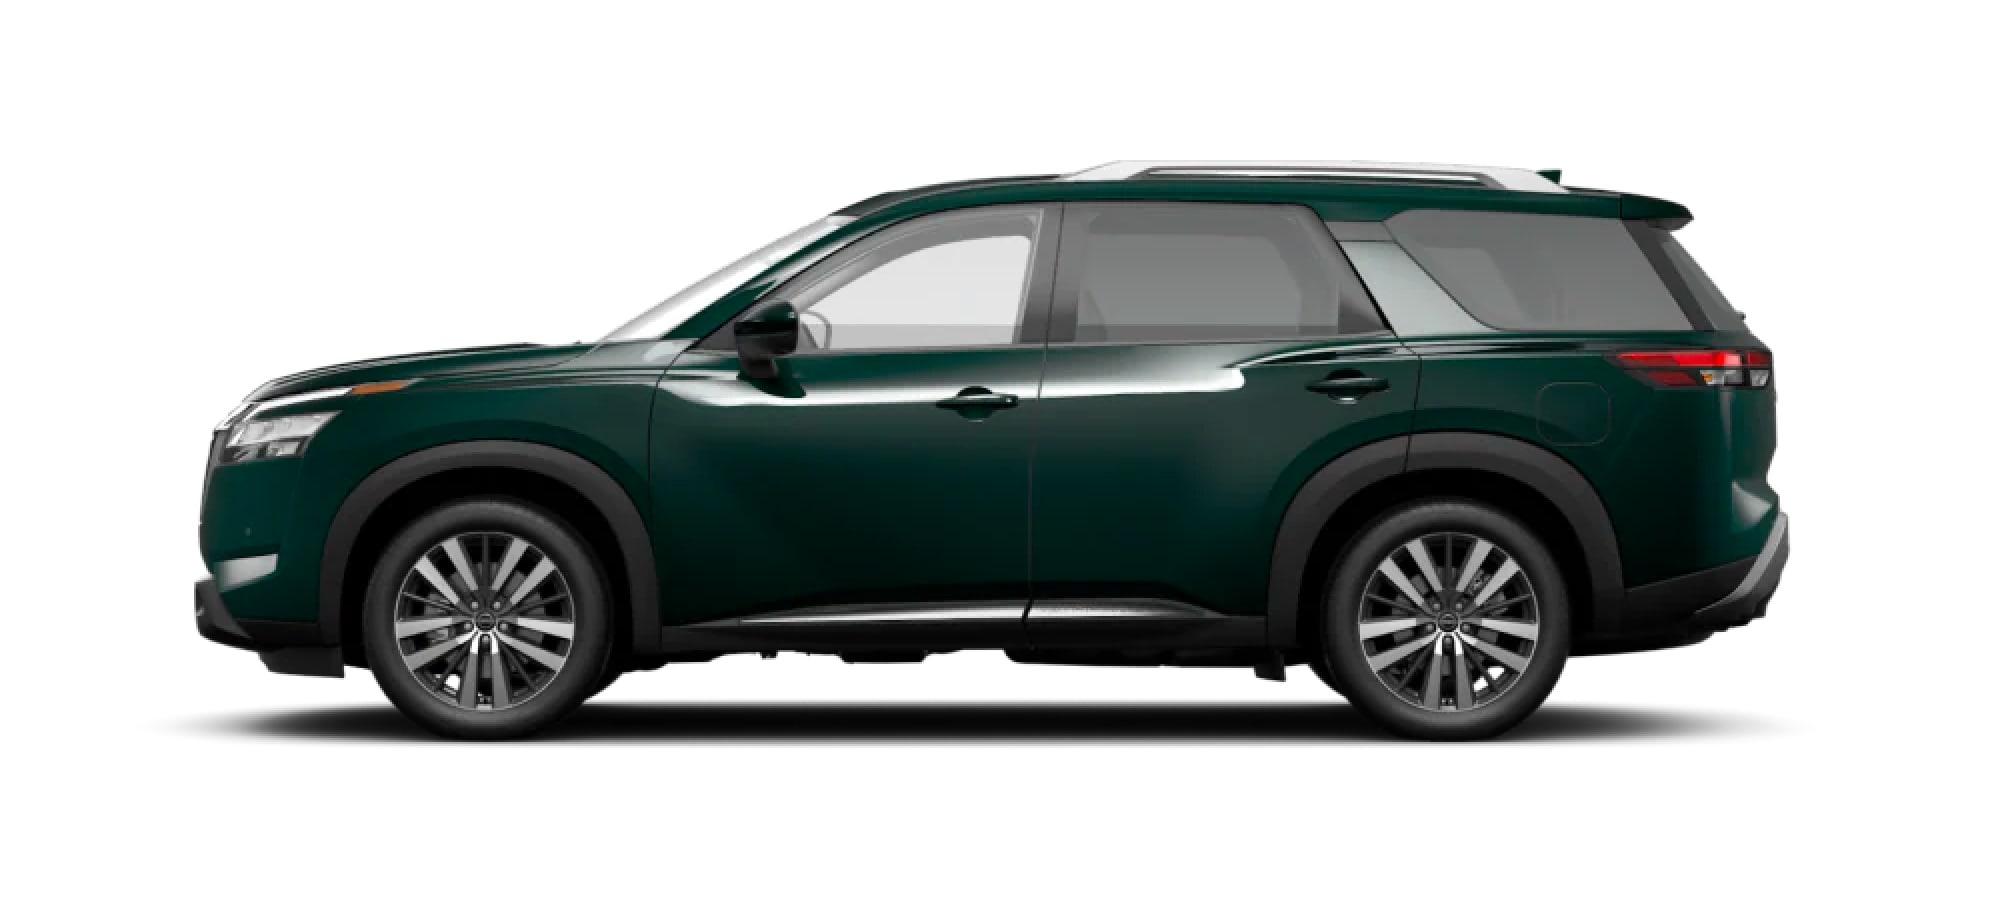 2022 Nissan Pathfinder in Obsidian Green Pearl